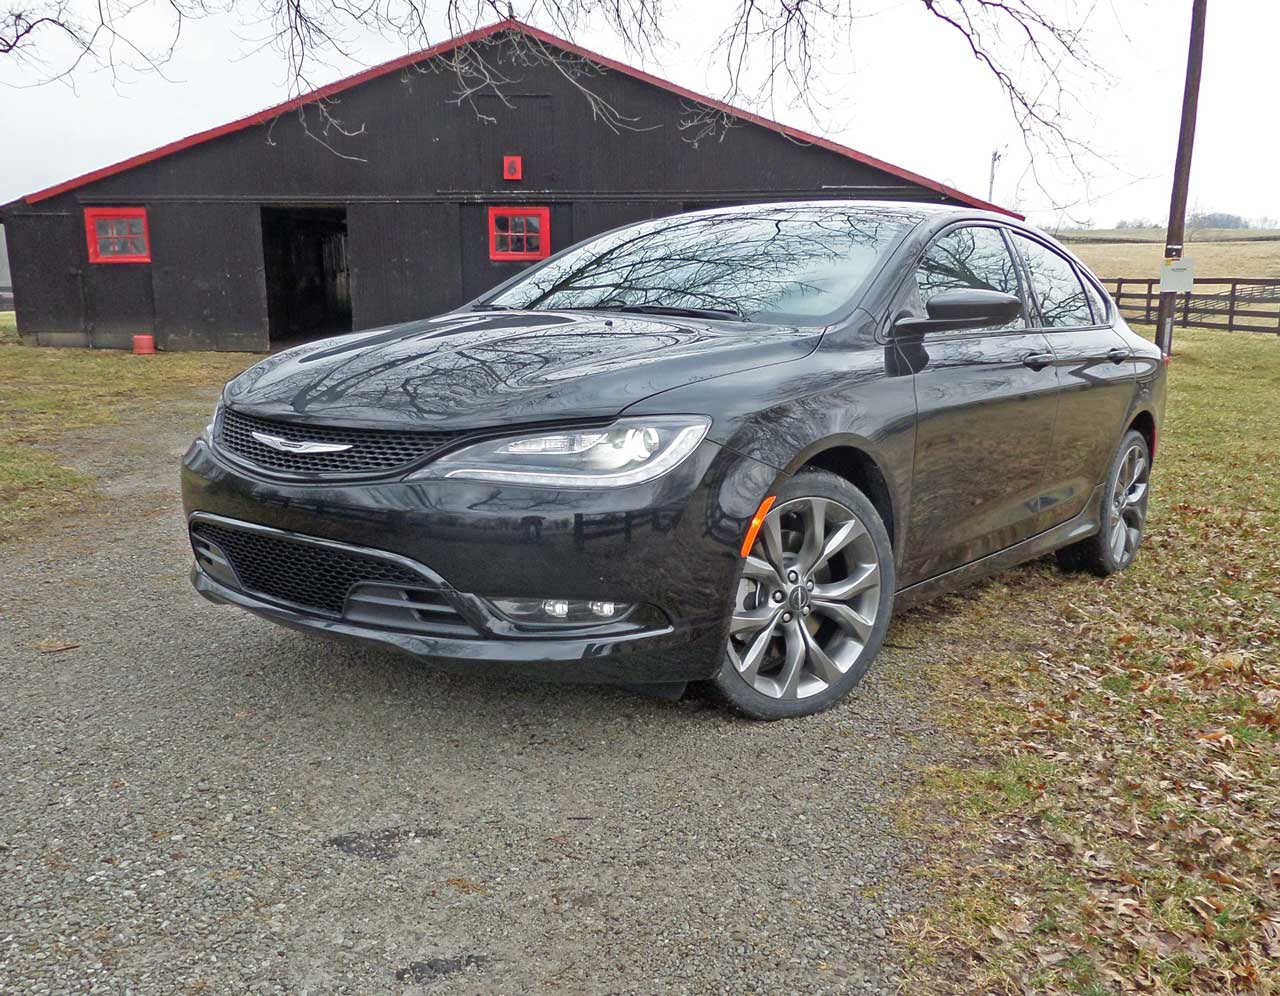 2015 Chrysler 200 Sedan Test Drive